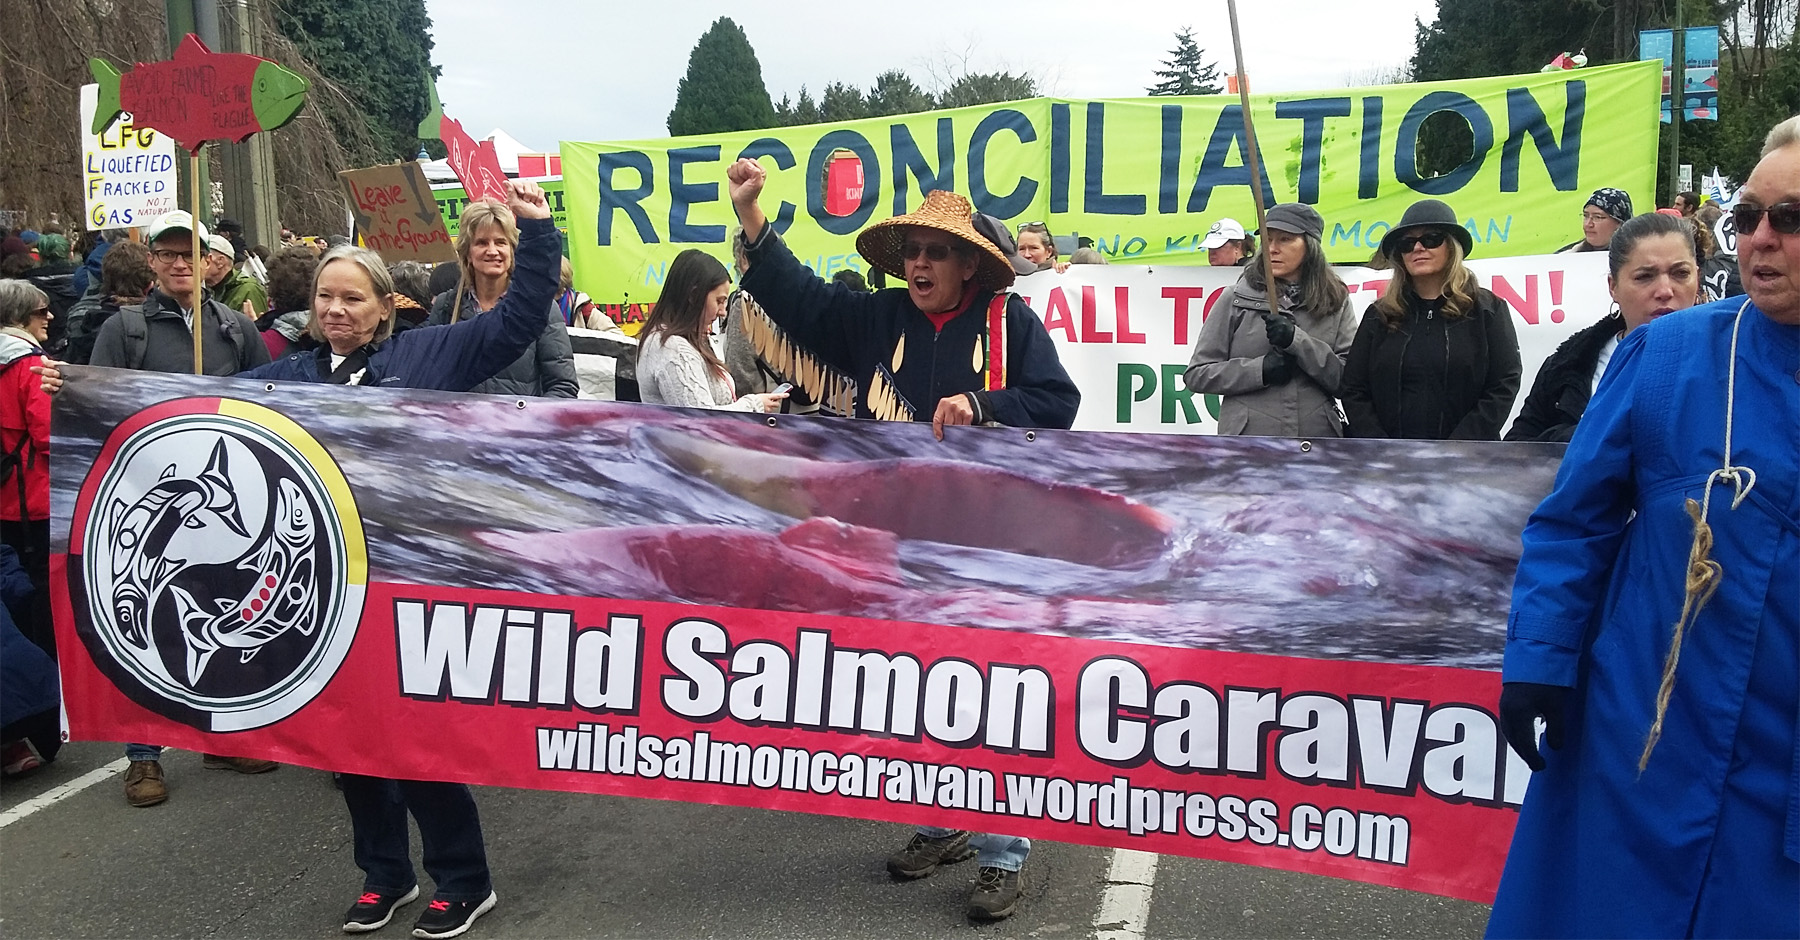 wild salmon caravan - eddie gardner